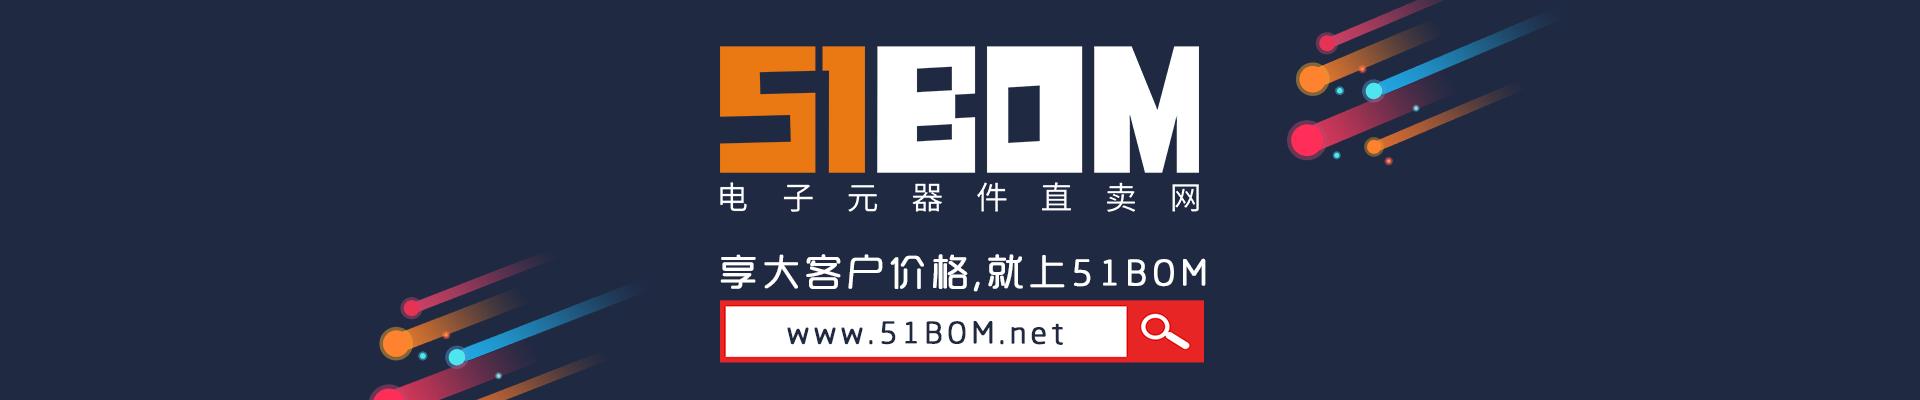 51BOM电子元器件直卖网